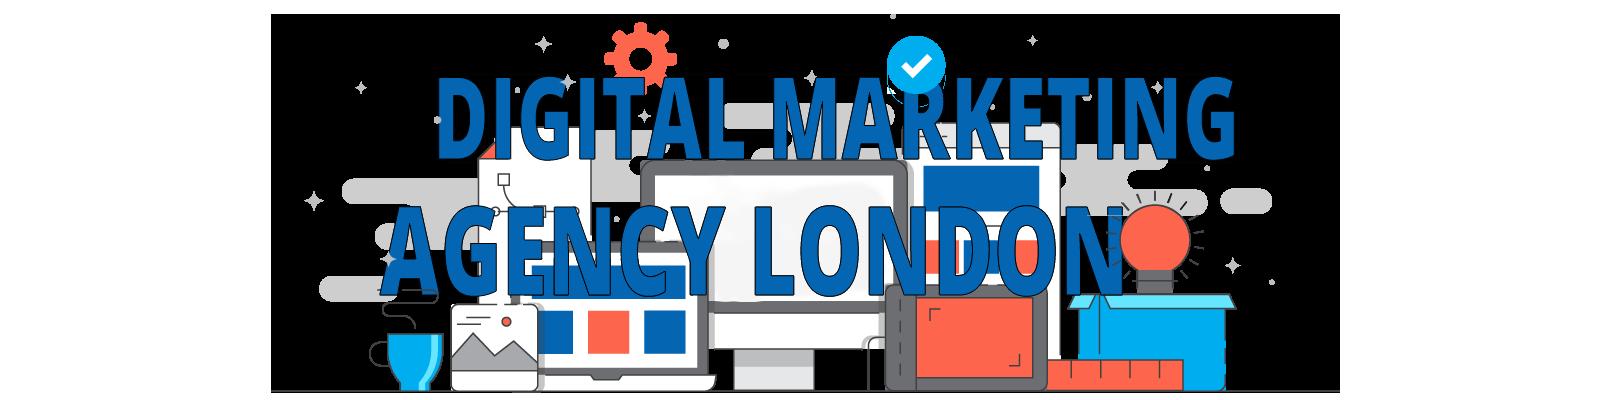 seek social digital marketing agency london header with transparent background